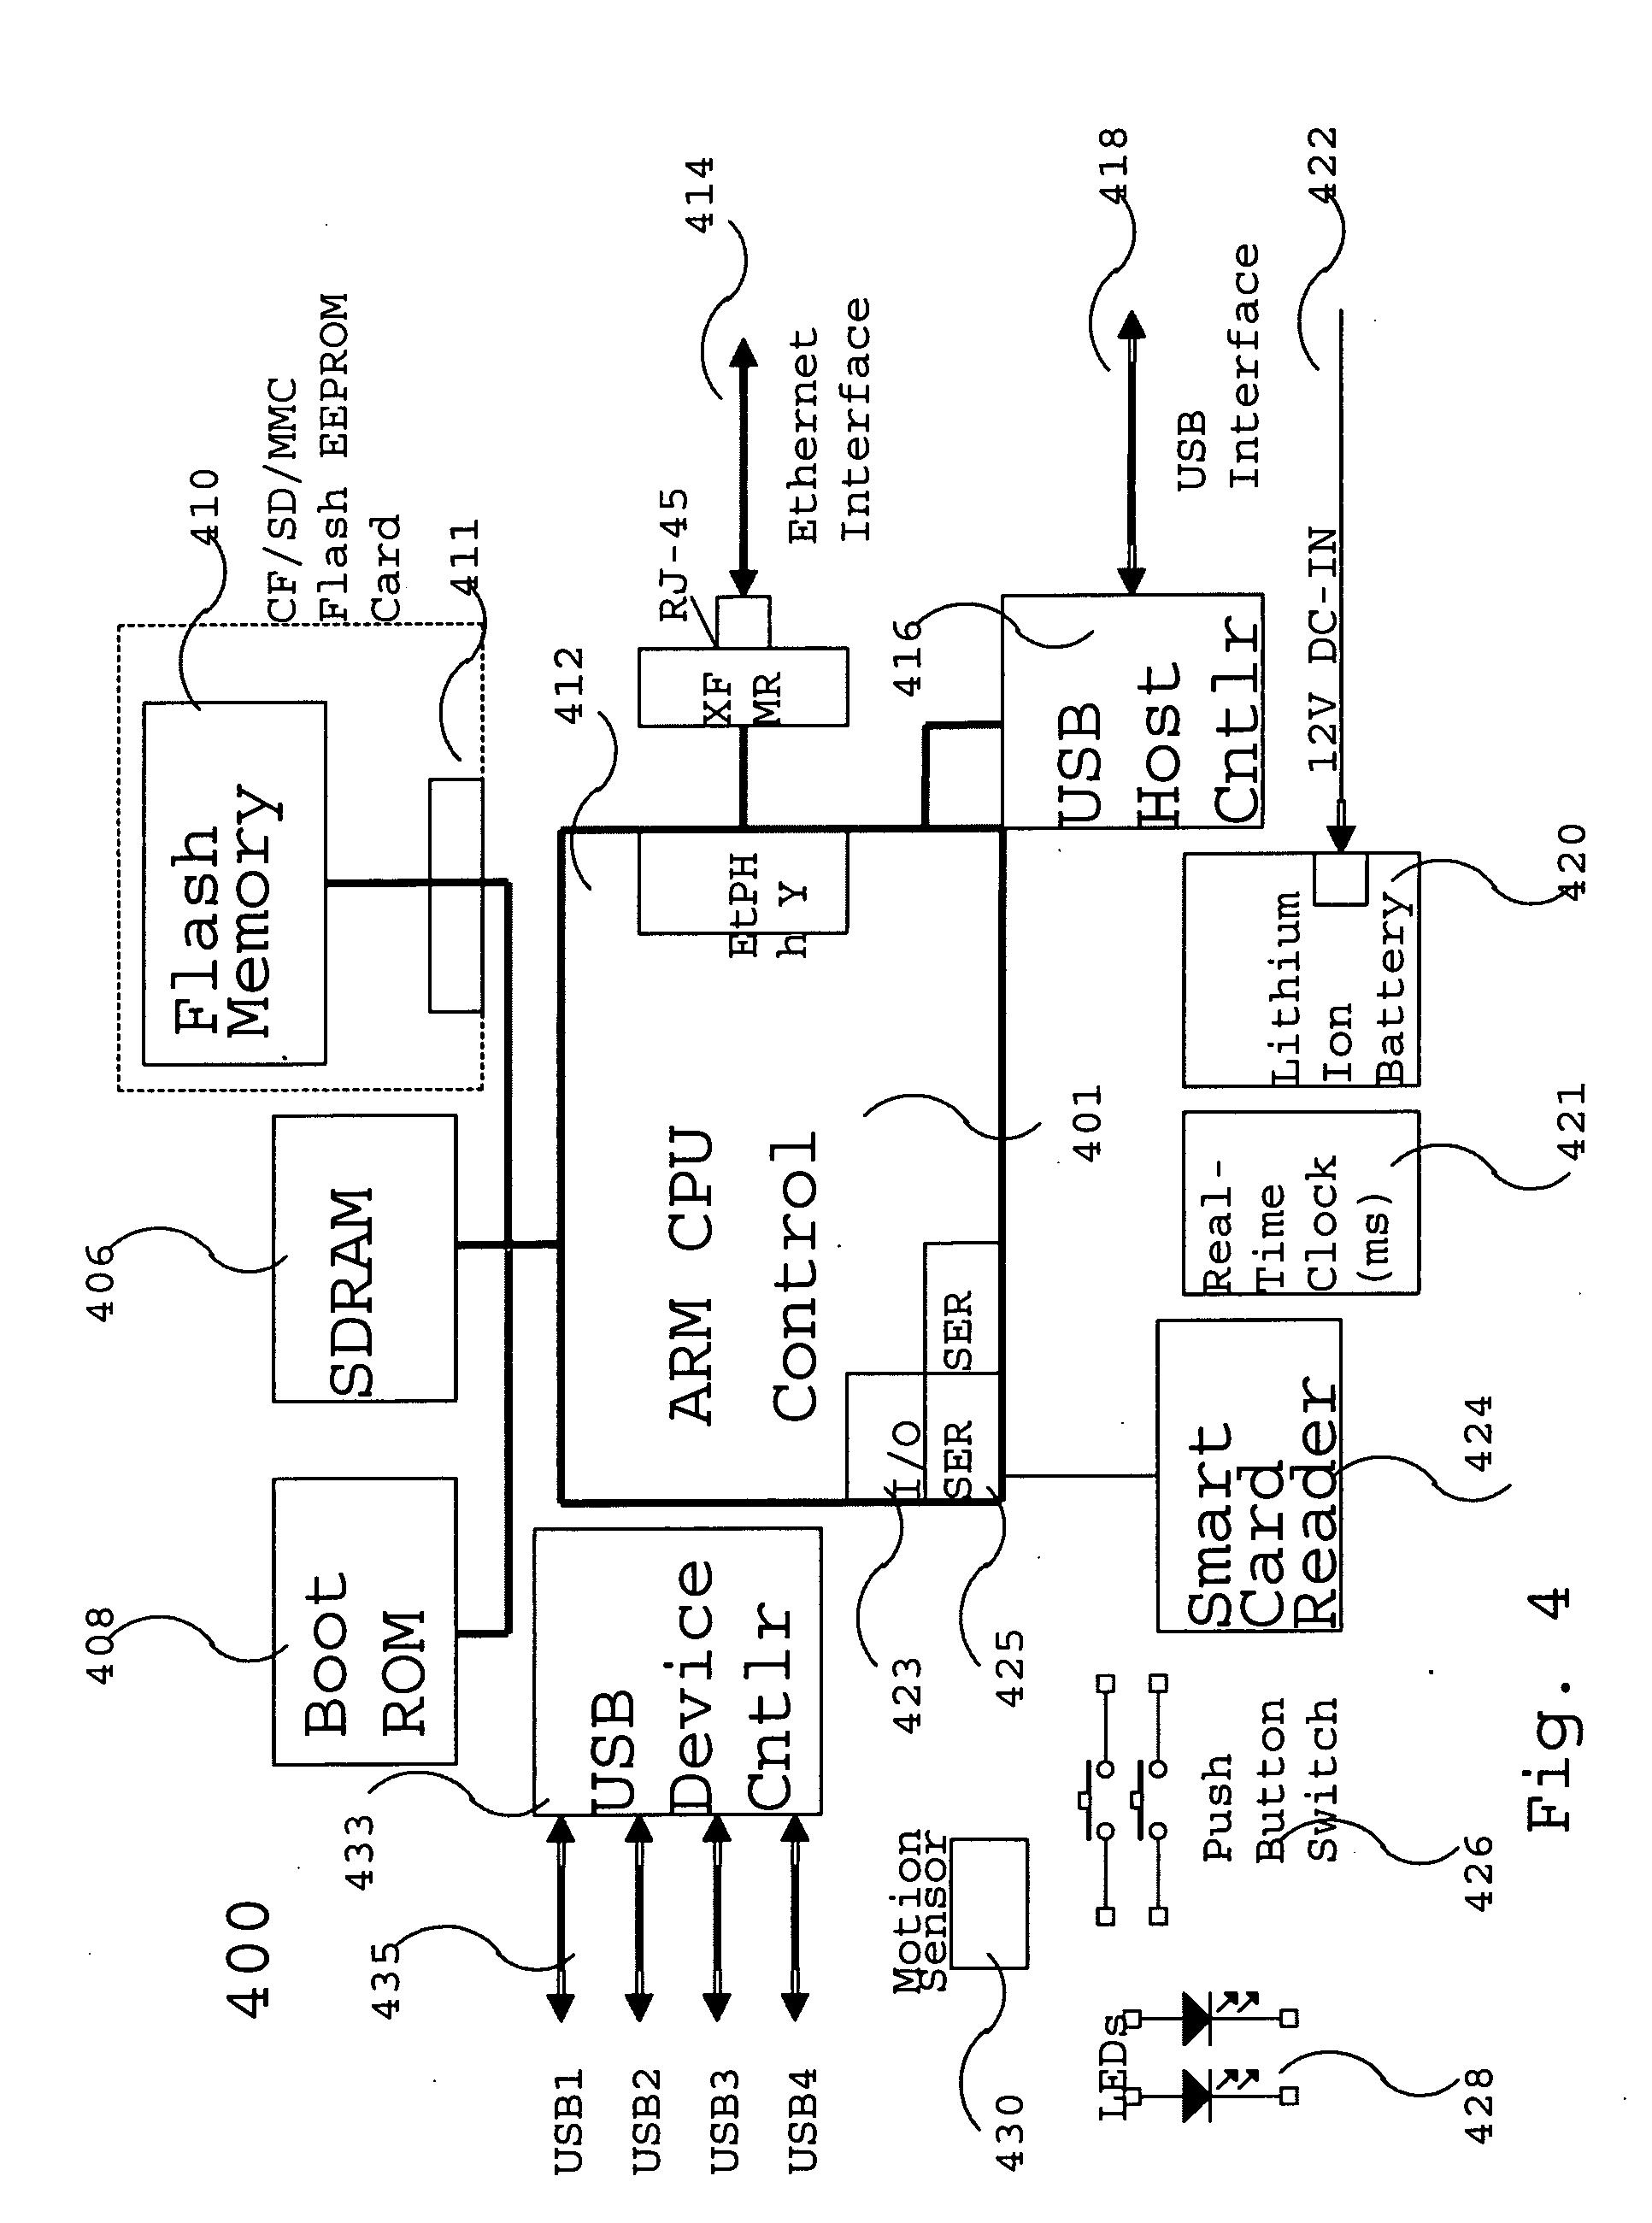 24v alternator wiring diagram ford taurus generator moreover 24 volt